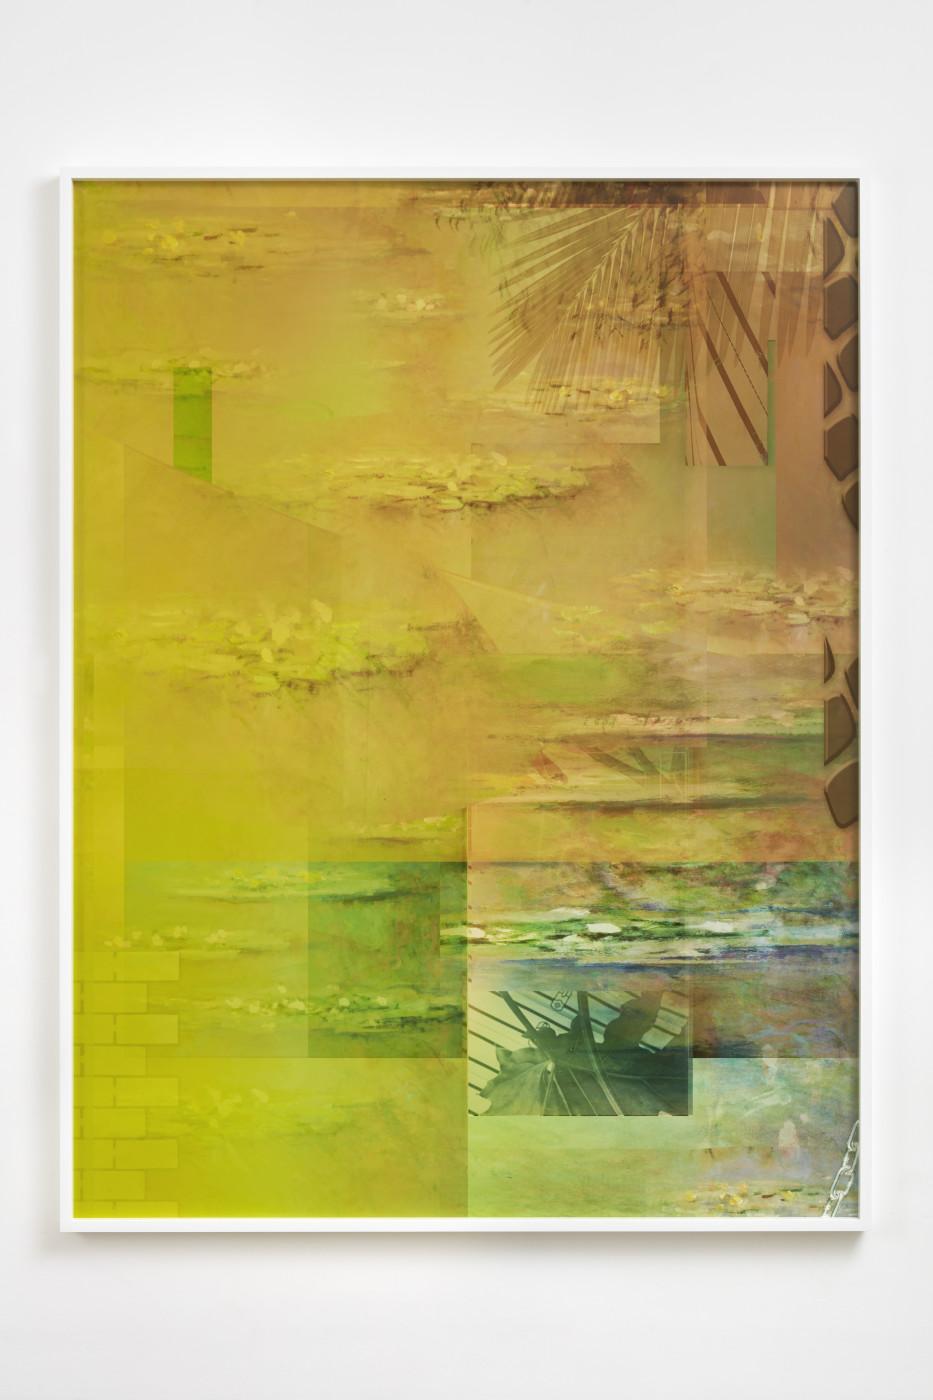 "<div class=""artwork_caption""><div class=""title""><em>Nymphaea alba</em>, 2018</div><div class=""medium"">archival pigment print</div><div class=""dimensions"">205 x 156 x 5.7 cm / 80 ¾ x 61 ⅜ x 2 ¼ in</div></div>"